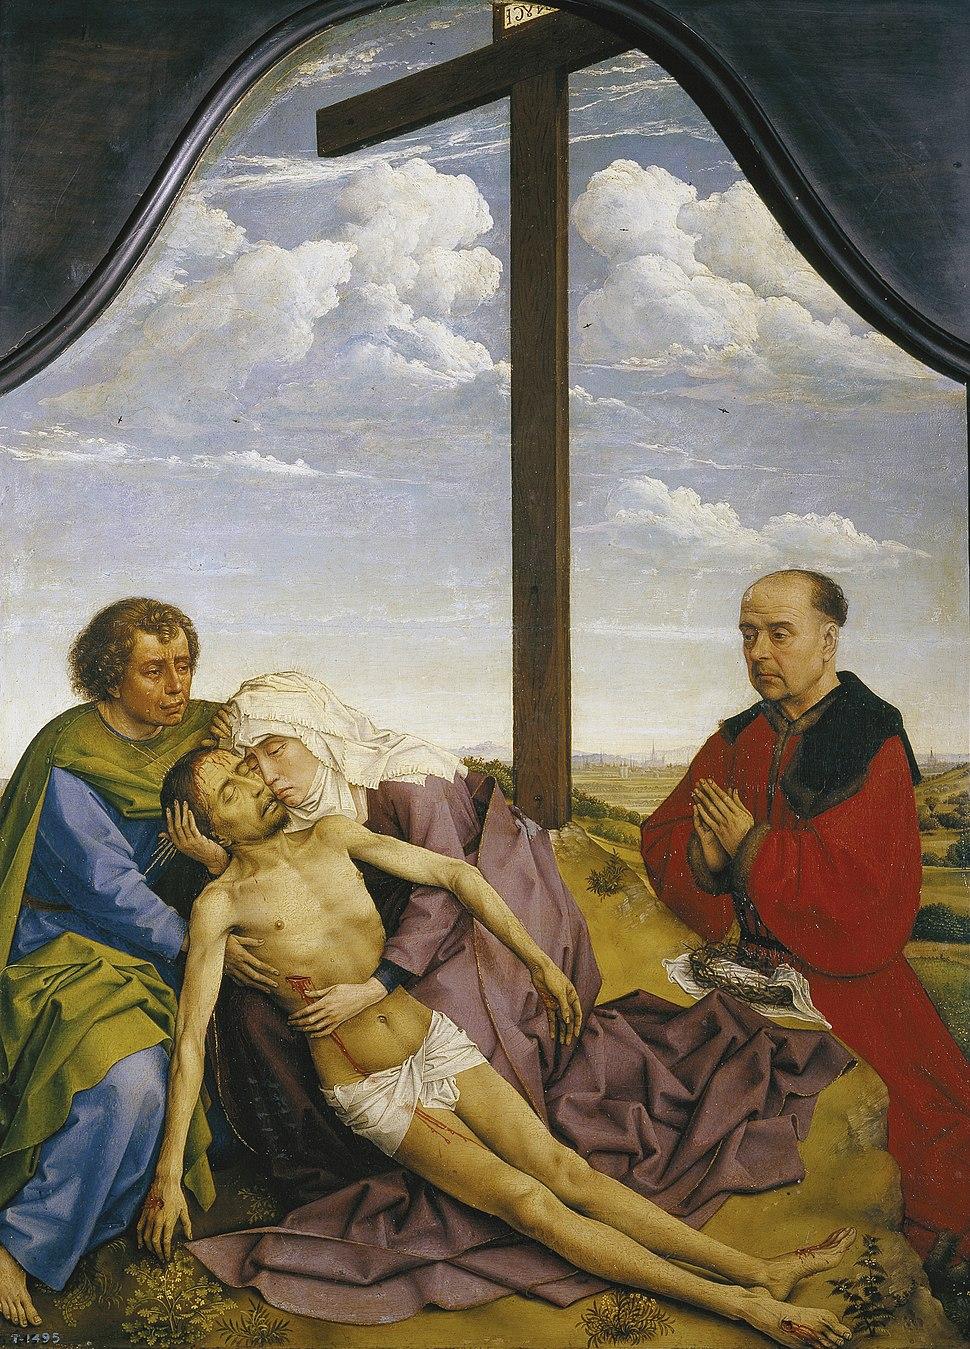 Lamento pola morte de Cristo, ca. 1456-59, Museo do Prado, Madrid